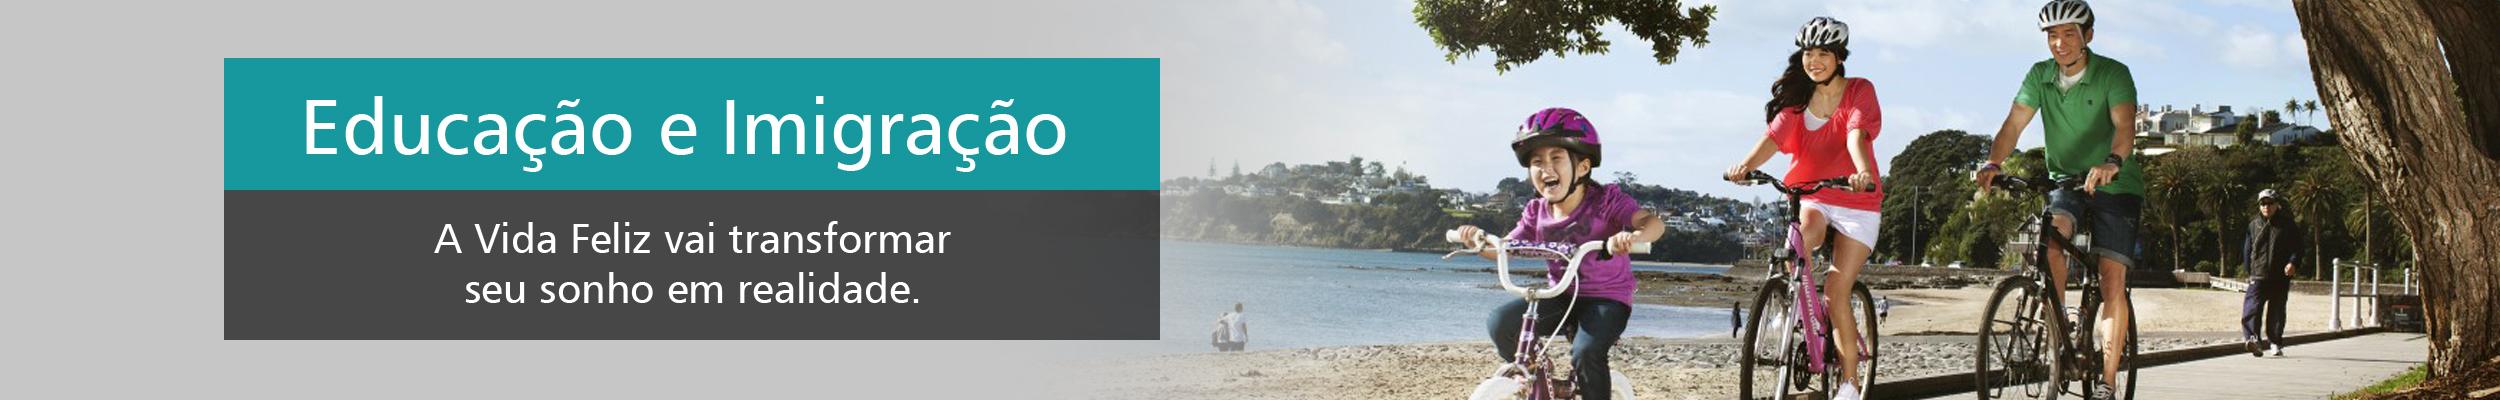 educacao-e-imigracao-nova-zelandia-vida-feliz